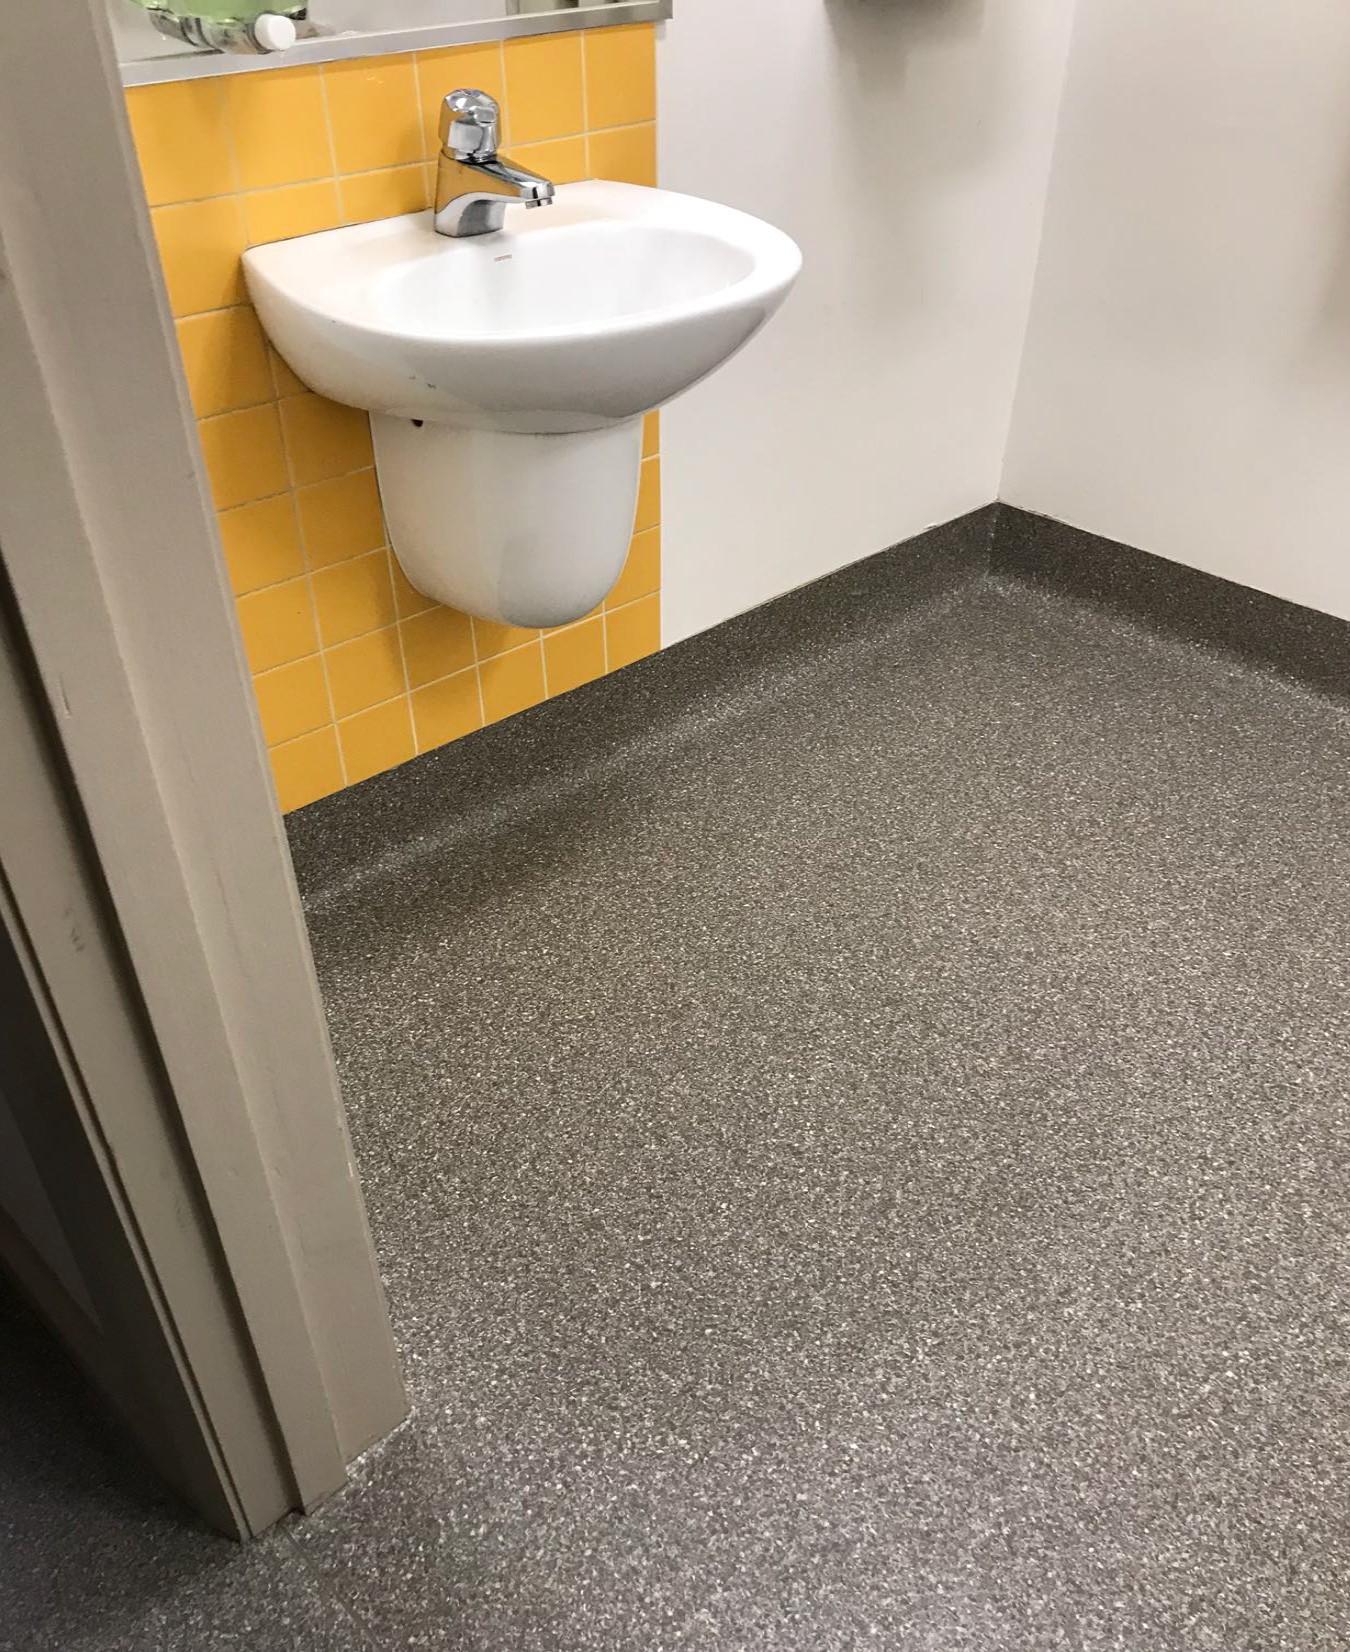 Commercial bathroom flooring